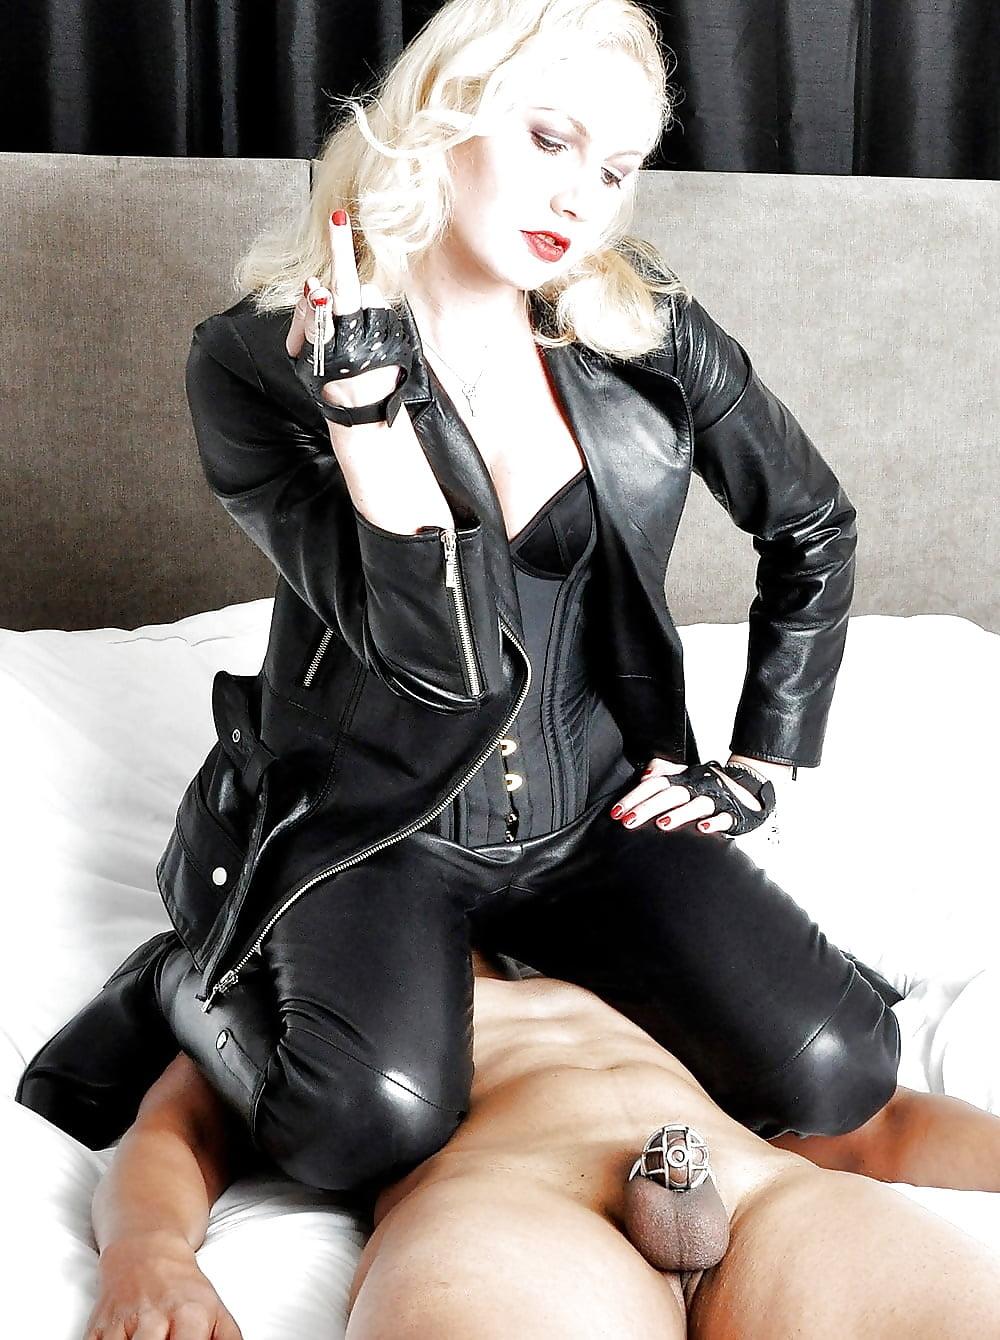 leather-femdom-mistress-chastity-peach-amateur-pics